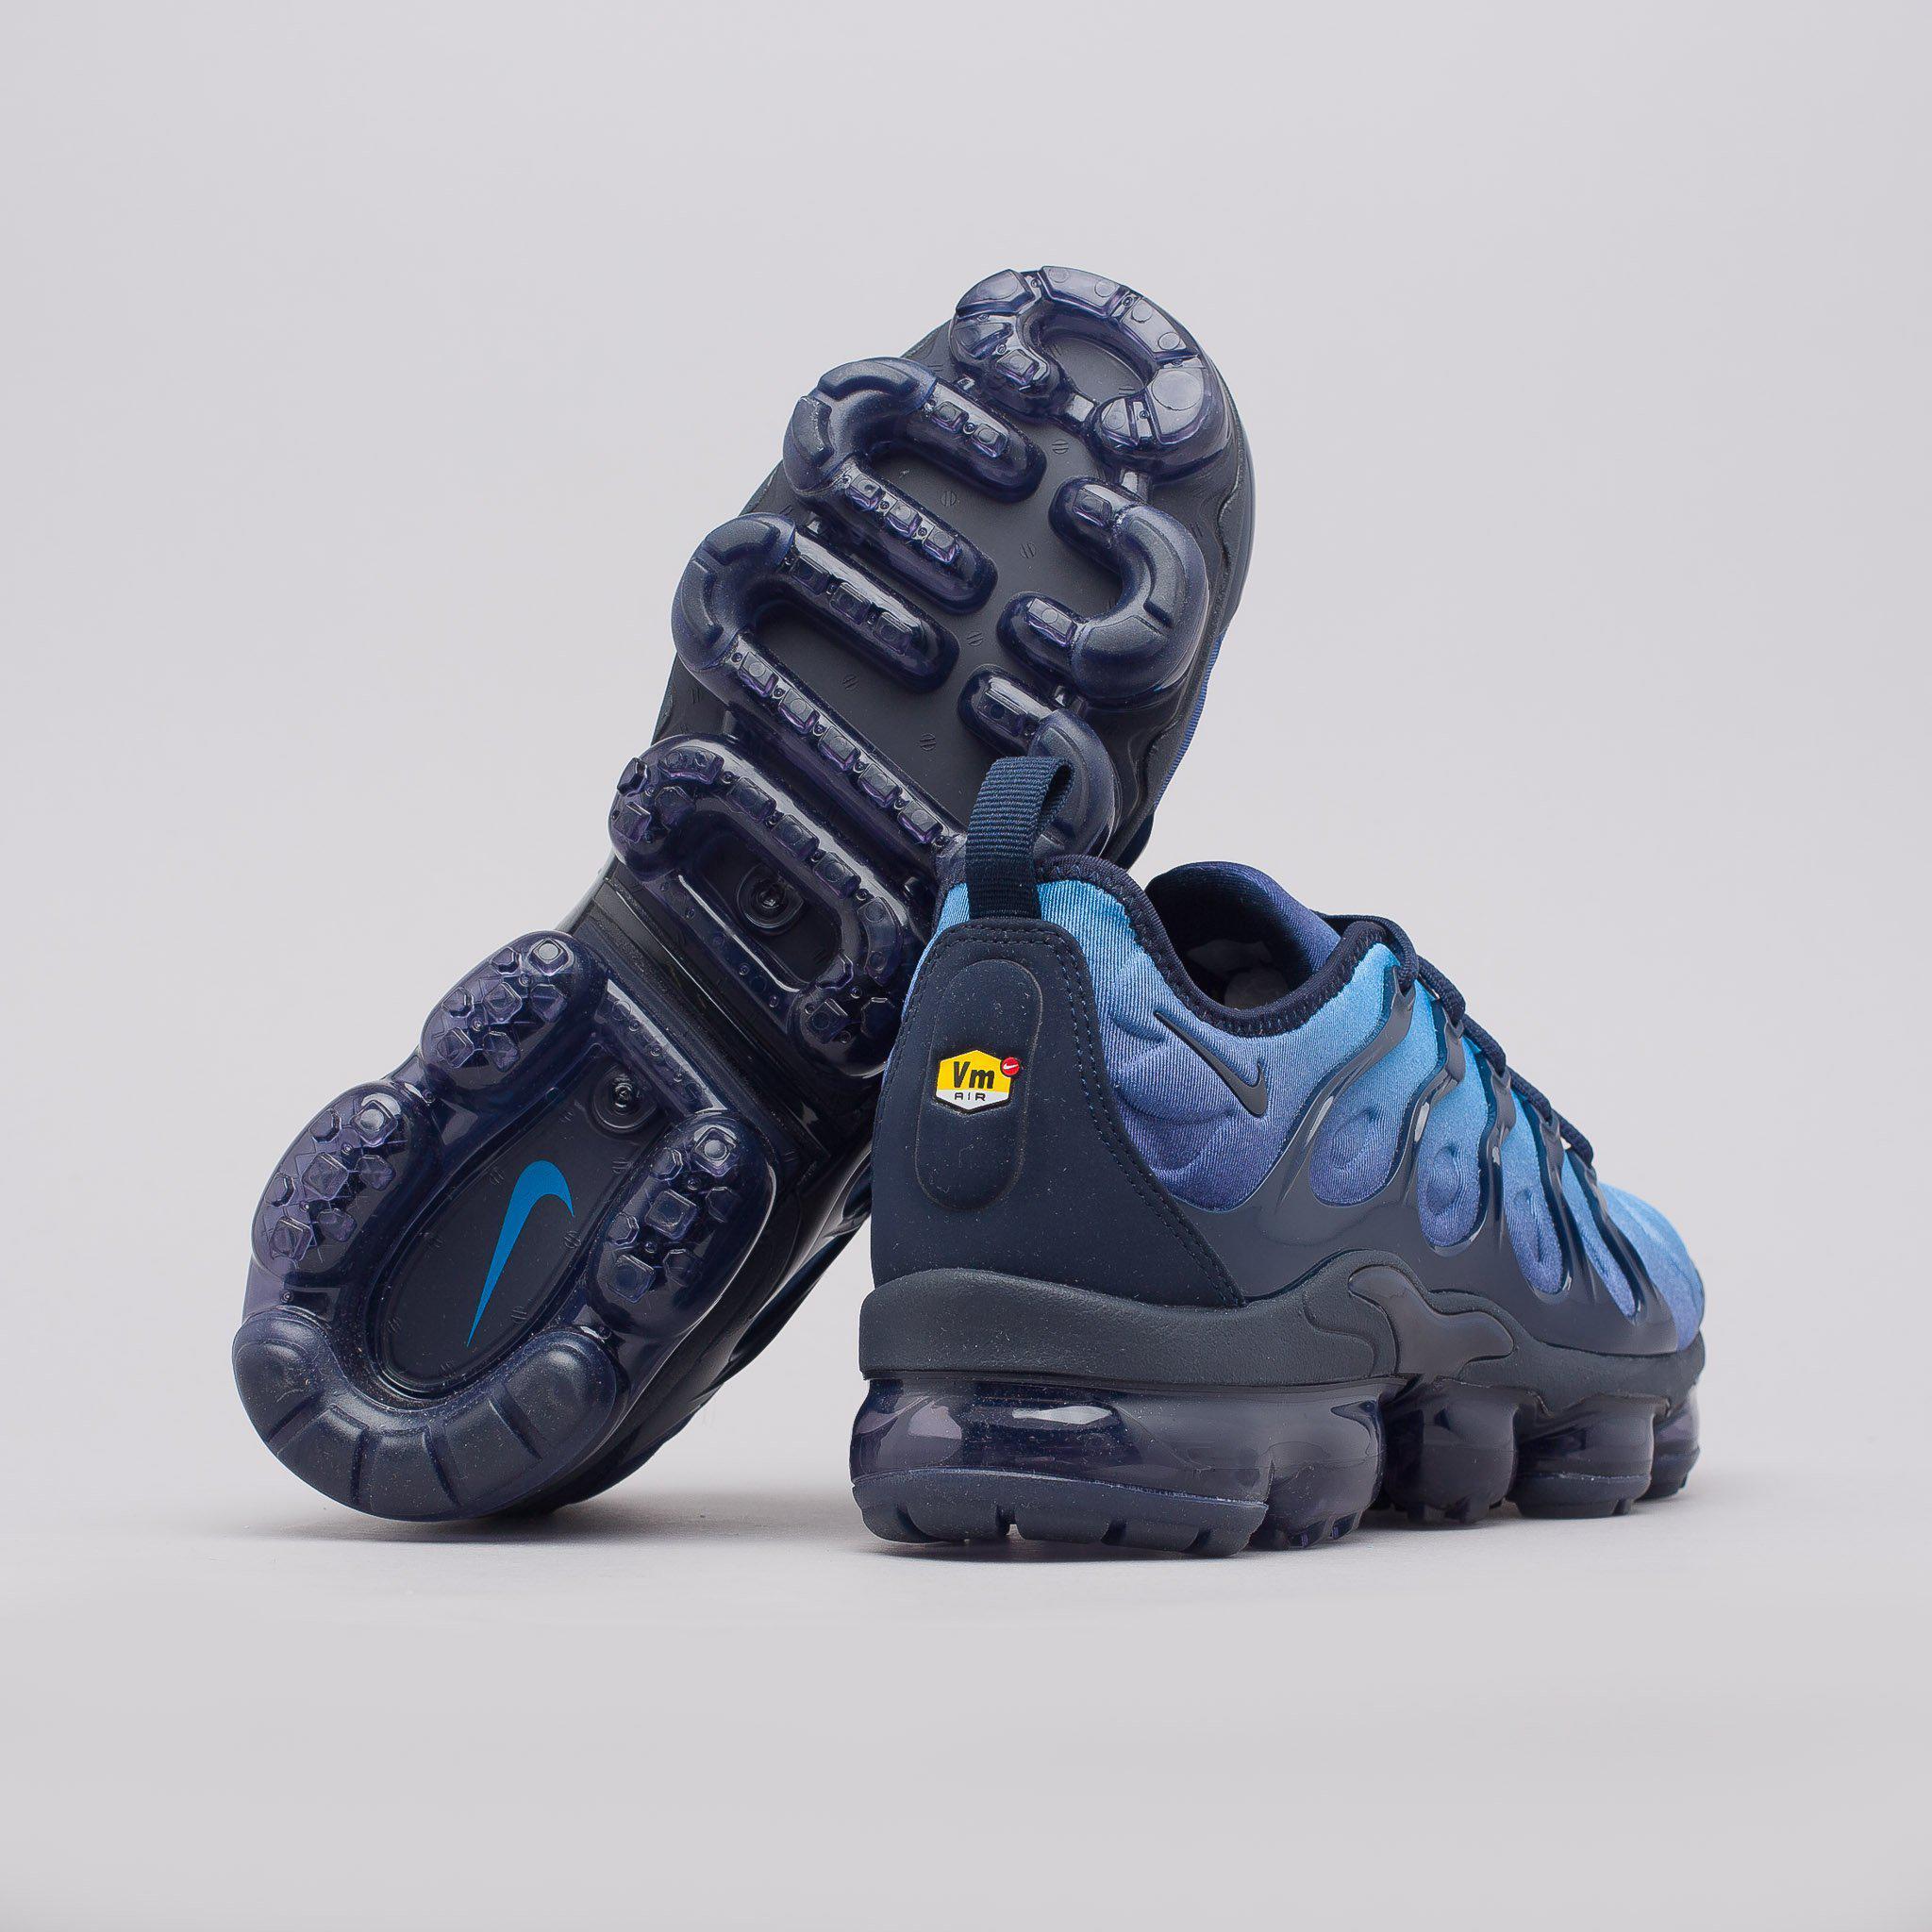 d954c0b48e1f8 Lyst - Nike Air Vapormax Plus In Obsidian in Blue for Men